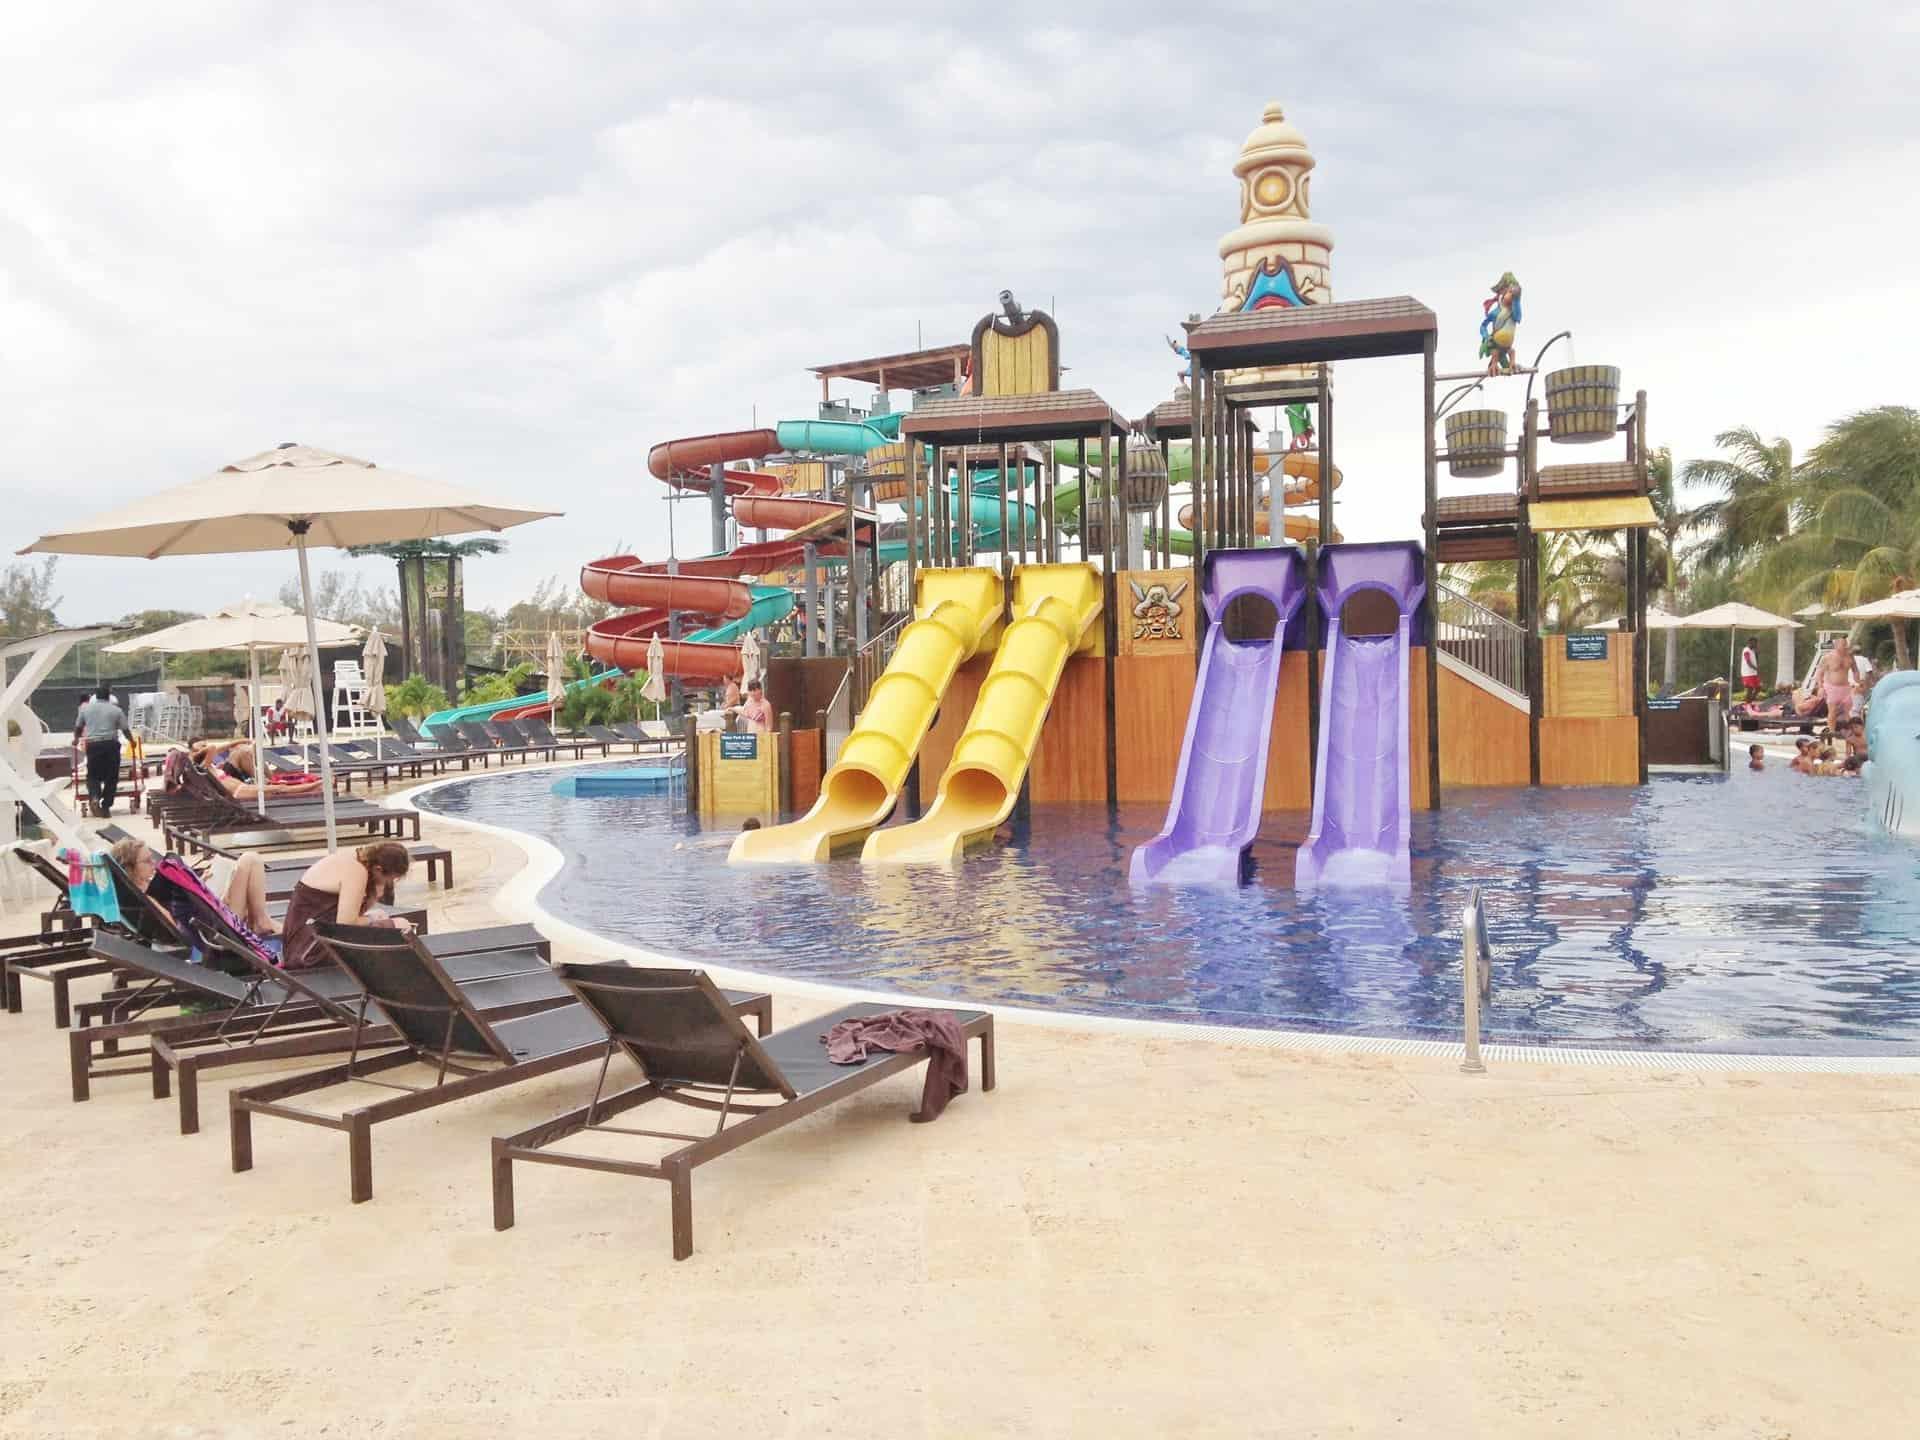 Freeport Memories Resort 2 Kids Pool Area Bahamas Cruise Excursions